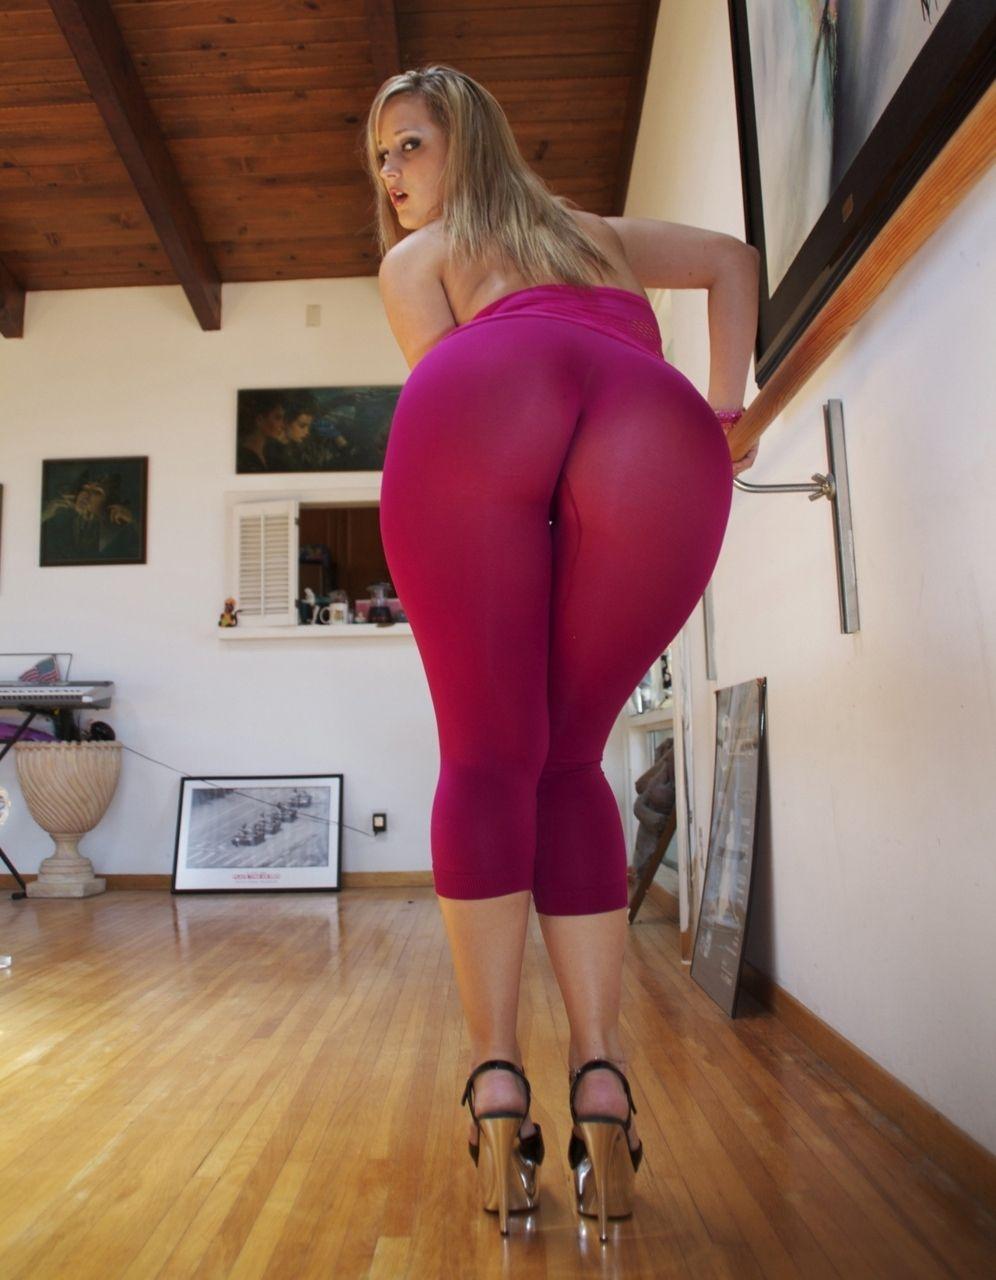 briella bounce - blonde in heels | id sex that | pinterest | blondes